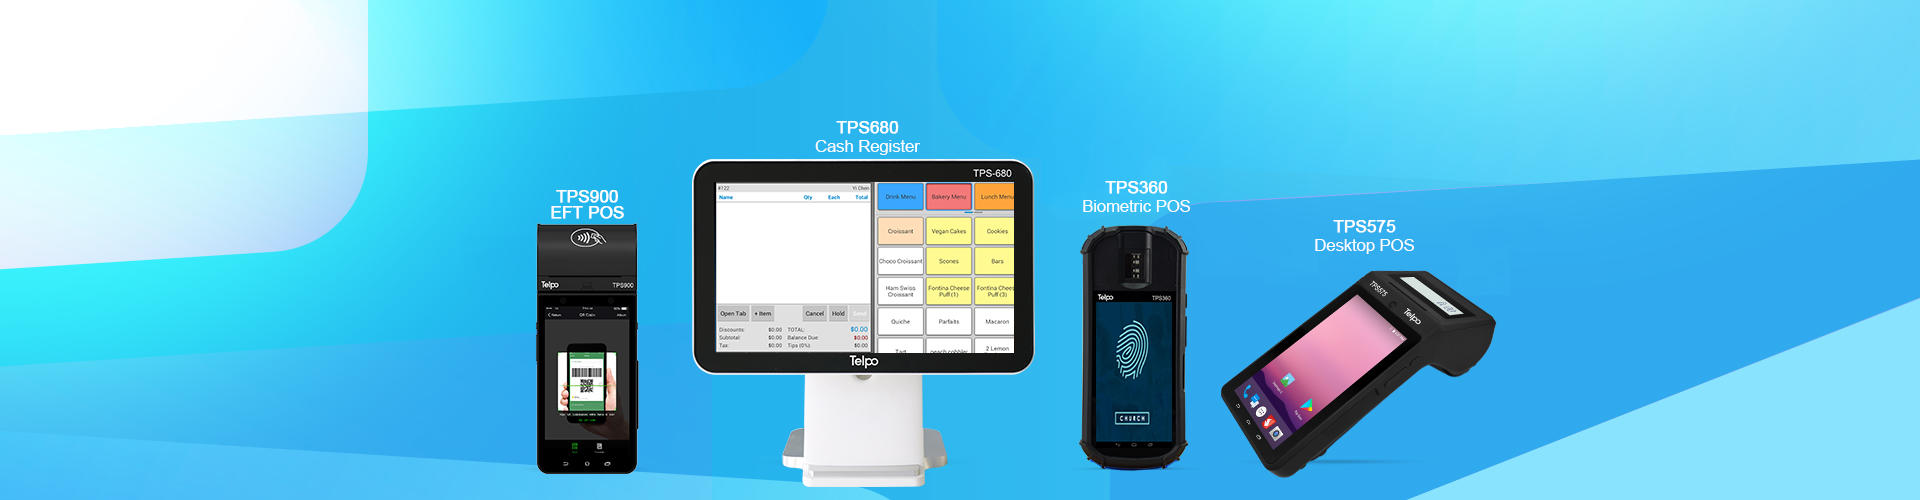 iris recognition-Telpo